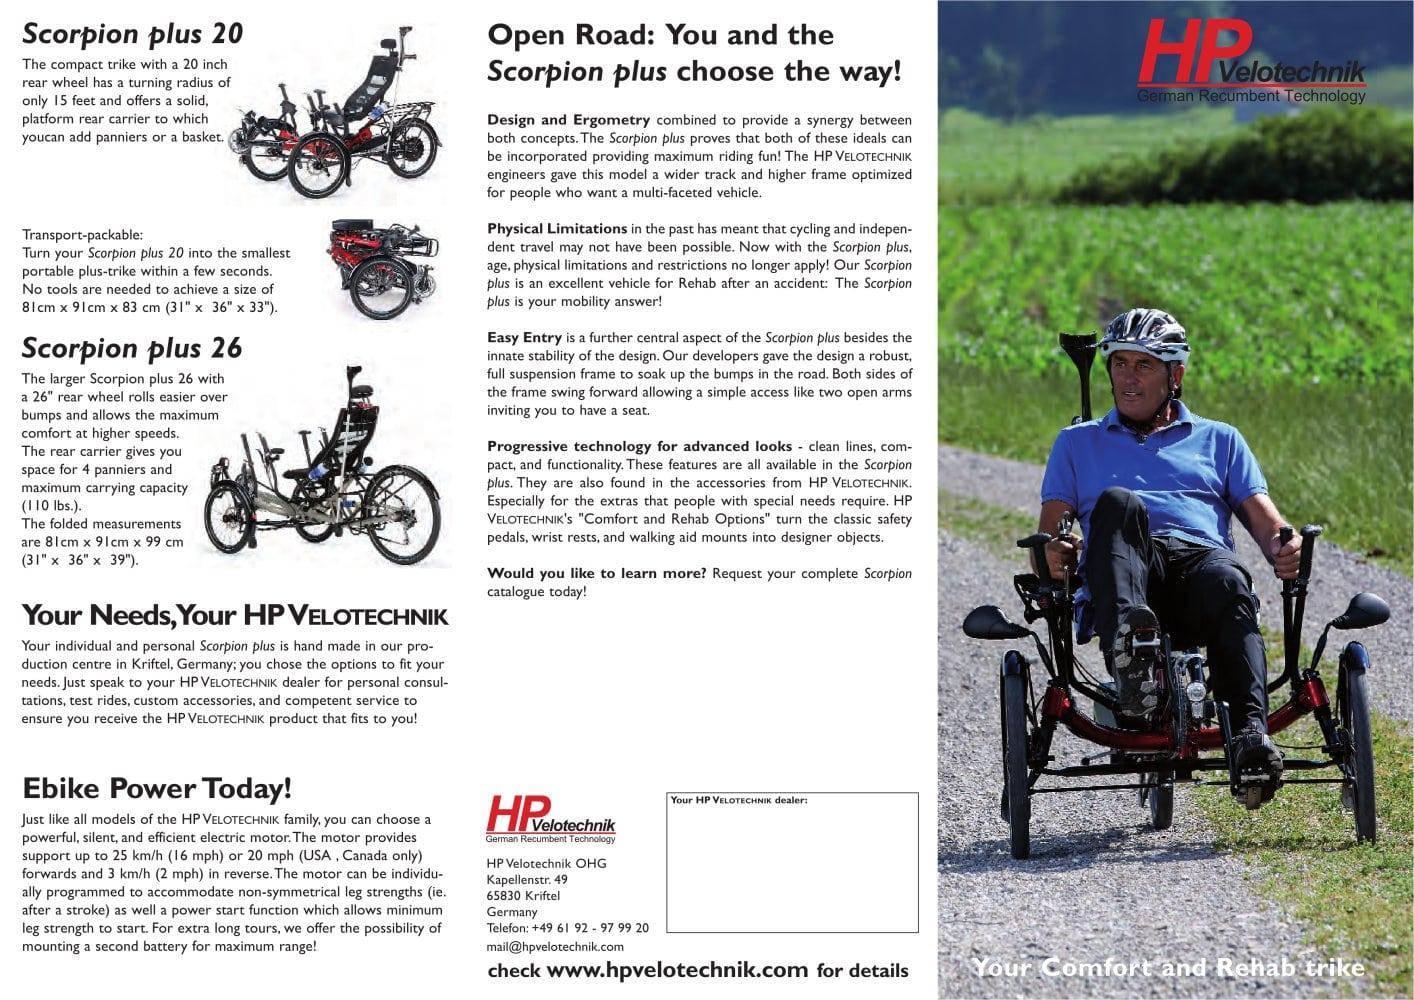 Scorpion Plus Rehab Brochure 2016 Hp Velotechnik Ohg Pdf